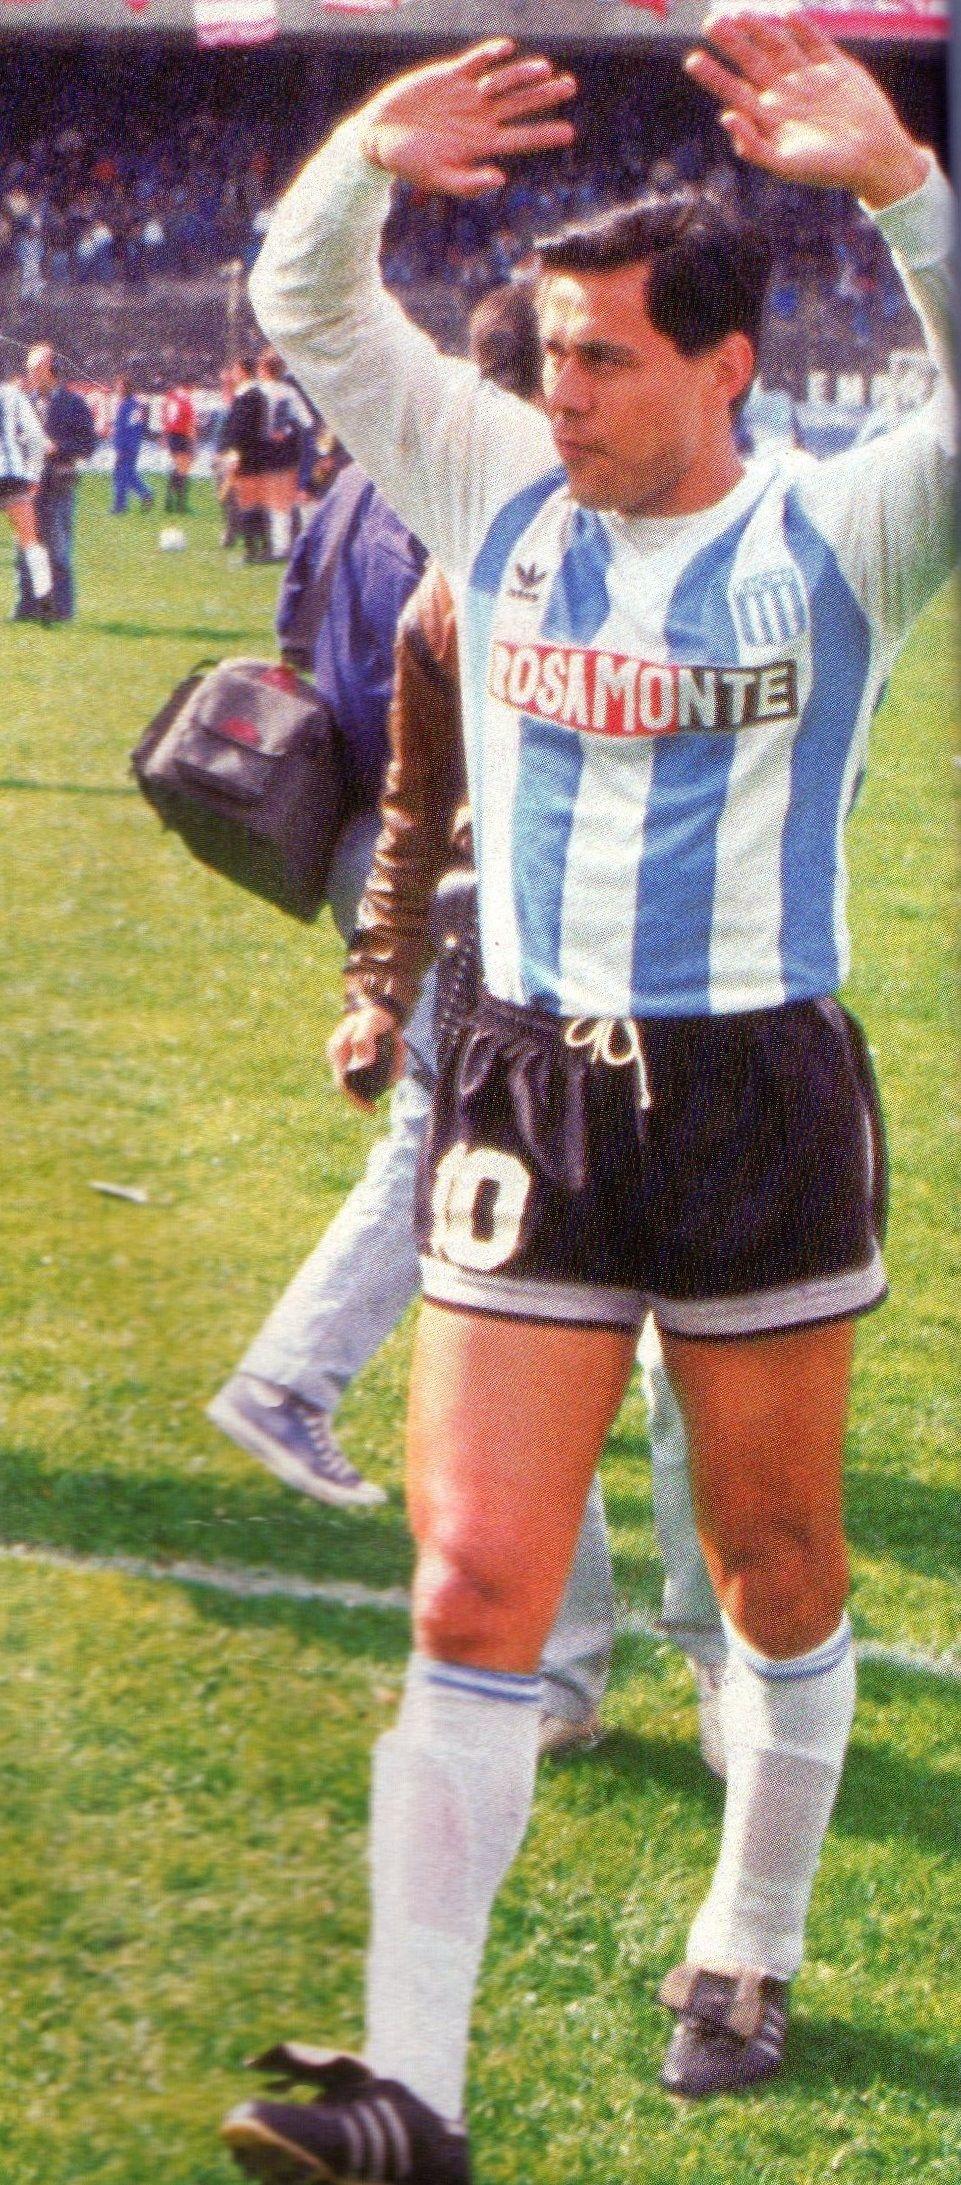 Rubén Paz, Uruguayo, cumpleaños, Racing, ídolo, ¡Uruguayo, uruguayo, uruguayo!